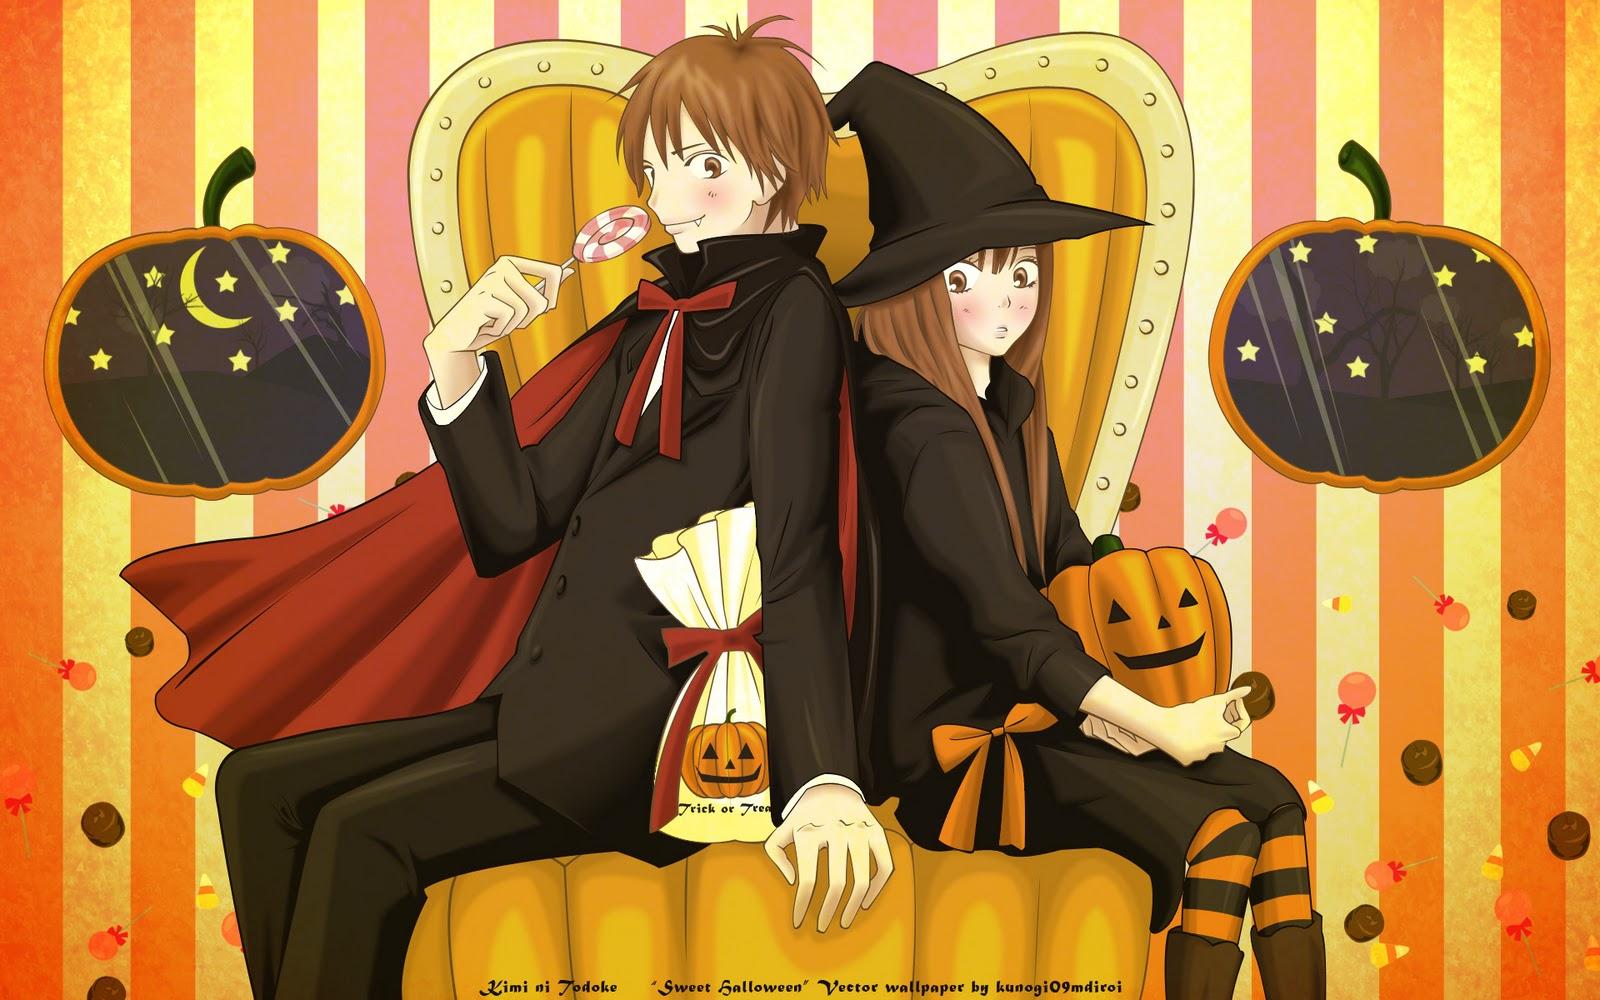 http://4.bp.blogspot.com/-JnklMDtsHCM/TqejTRckswI/AAAAAAAAAtk/MtN67ssYmSM/s1600/anime-halloween+wallpaper000.jpg